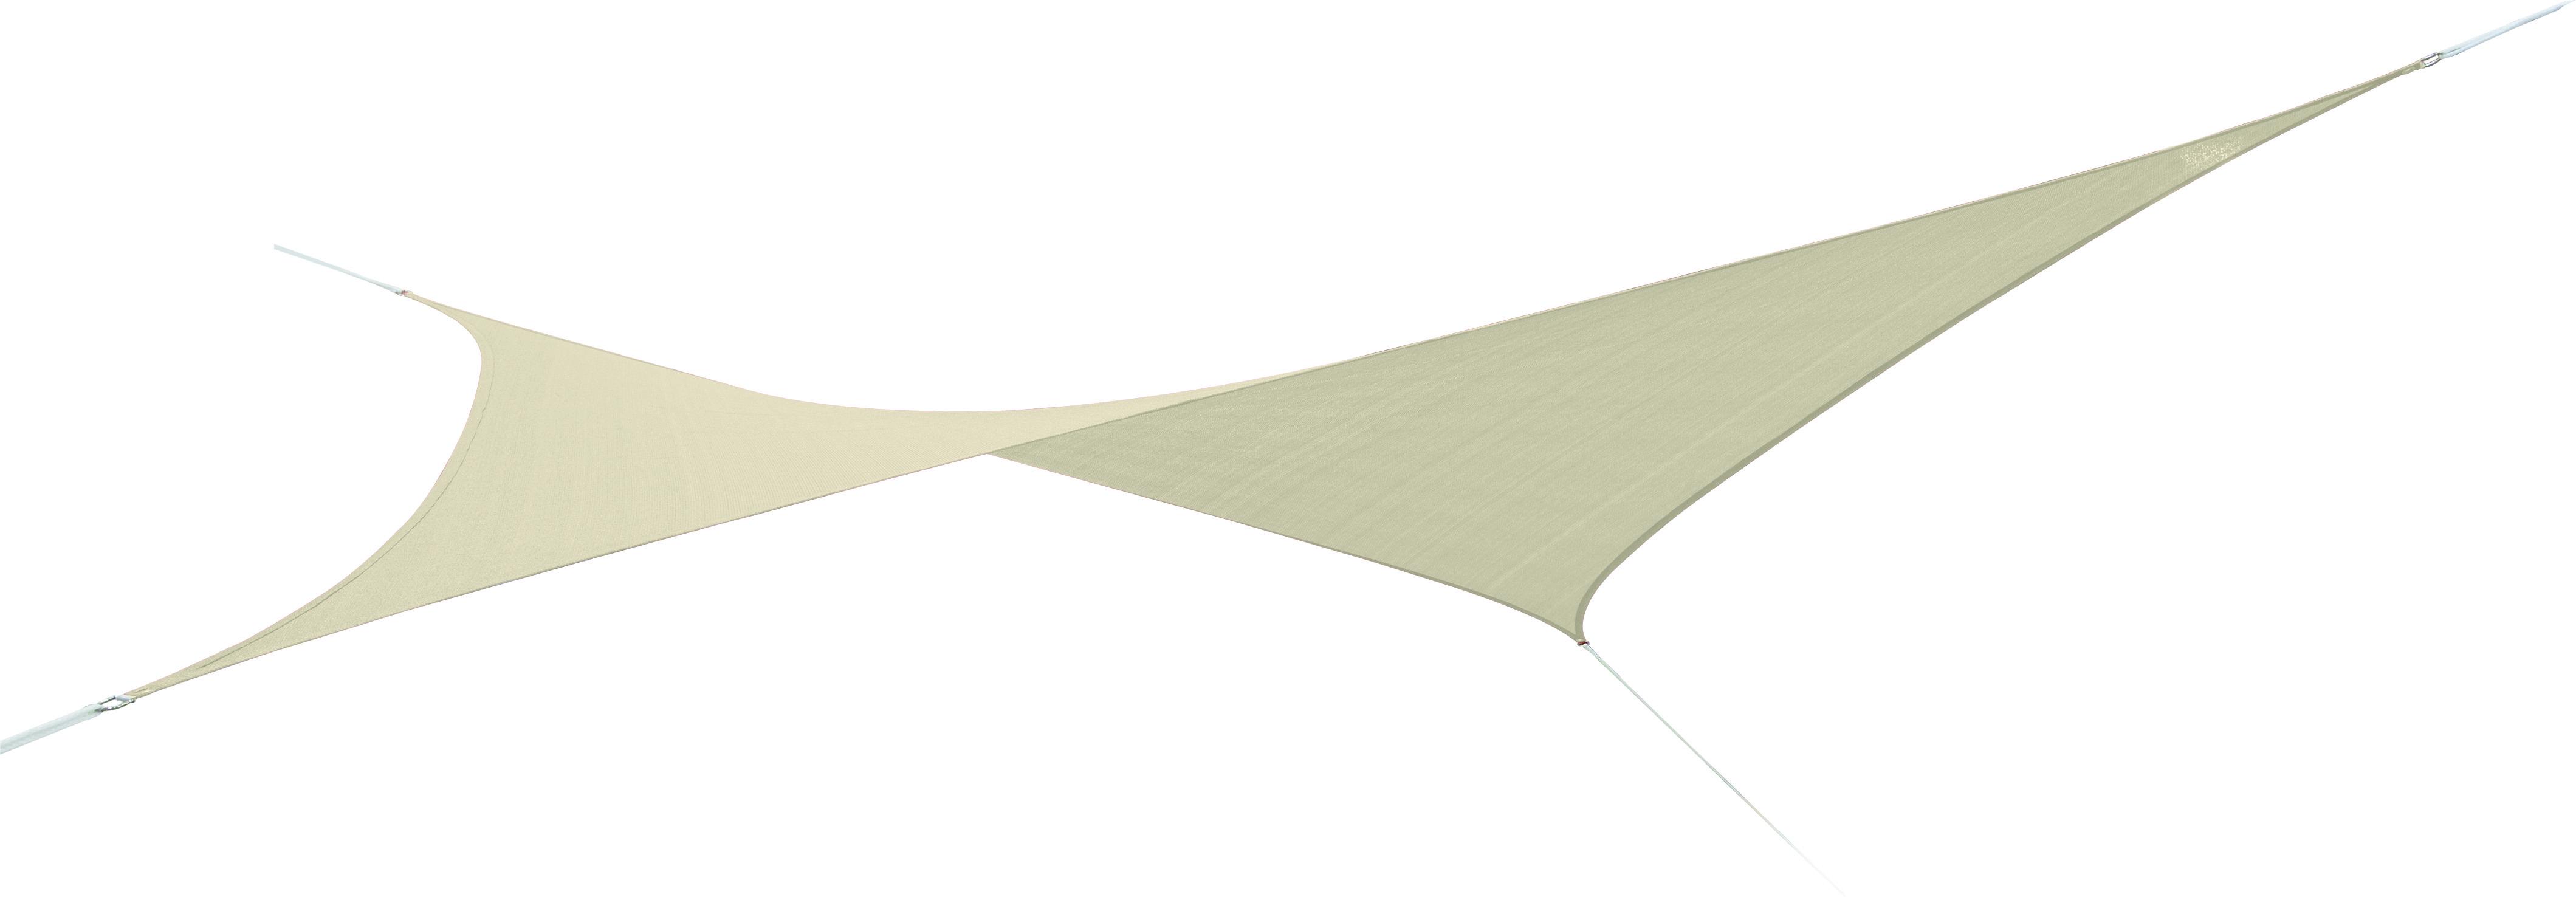 voile ombrage sable 3 6m carr e austral parasols voiles. Black Bedroom Furniture Sets. Home Design Ideas